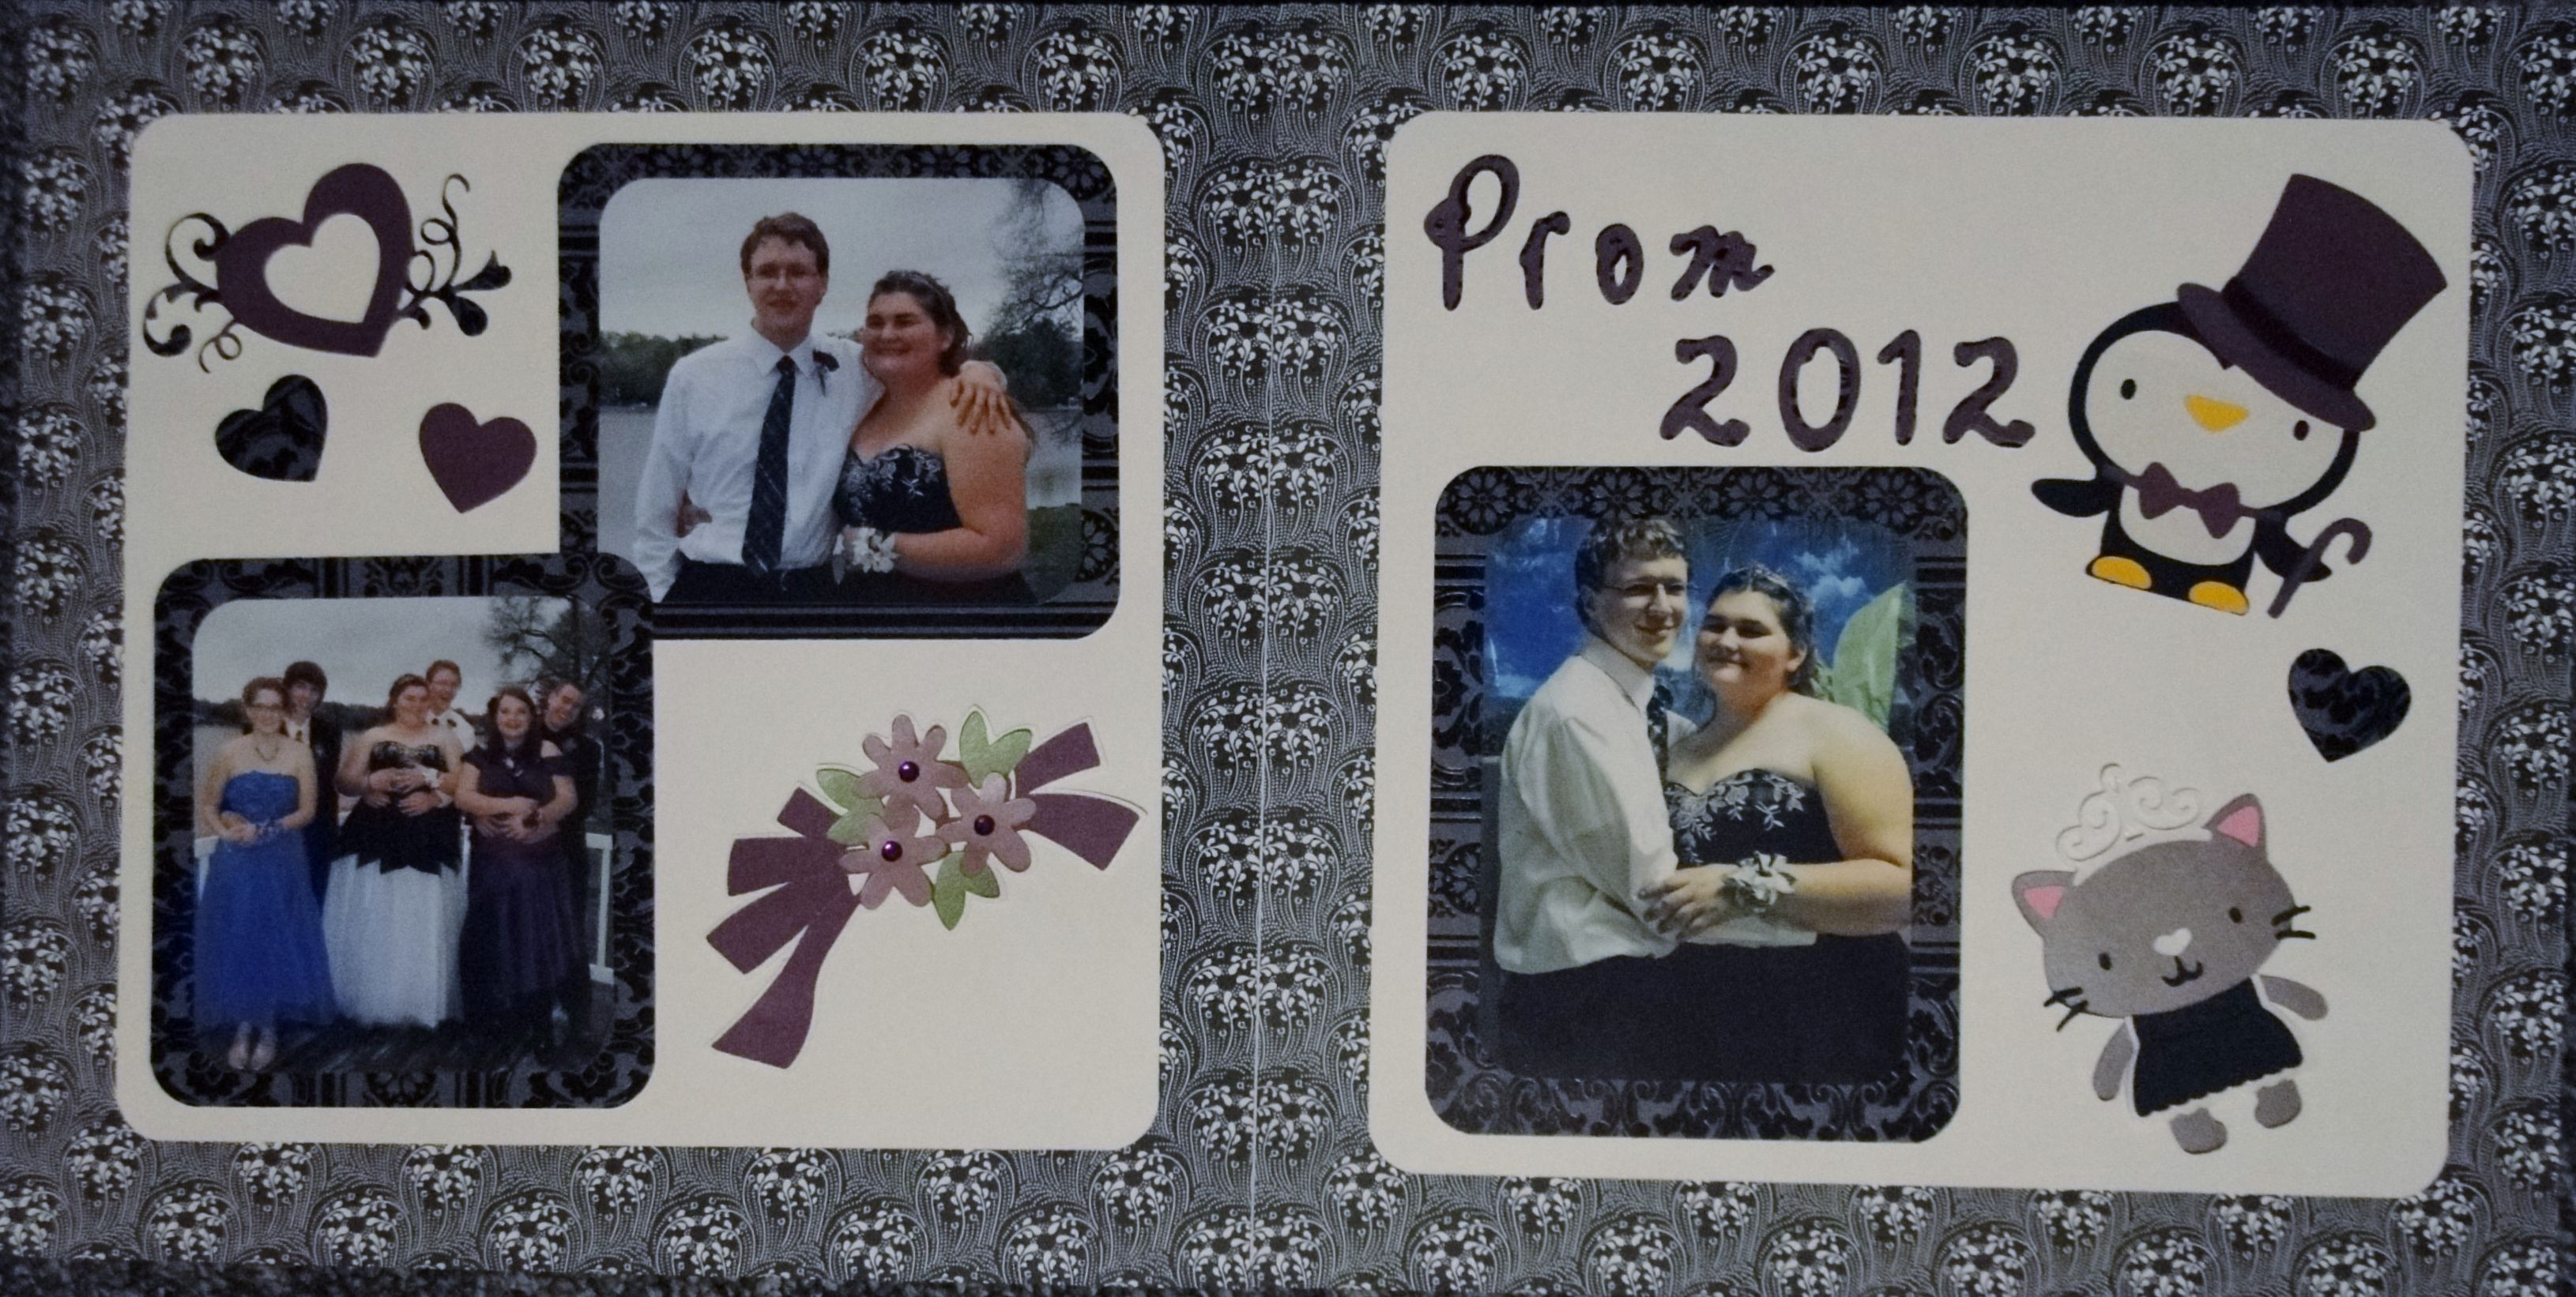 Scrapbook ideas using cricut - Scrapbook Prom Layout Using Cricut